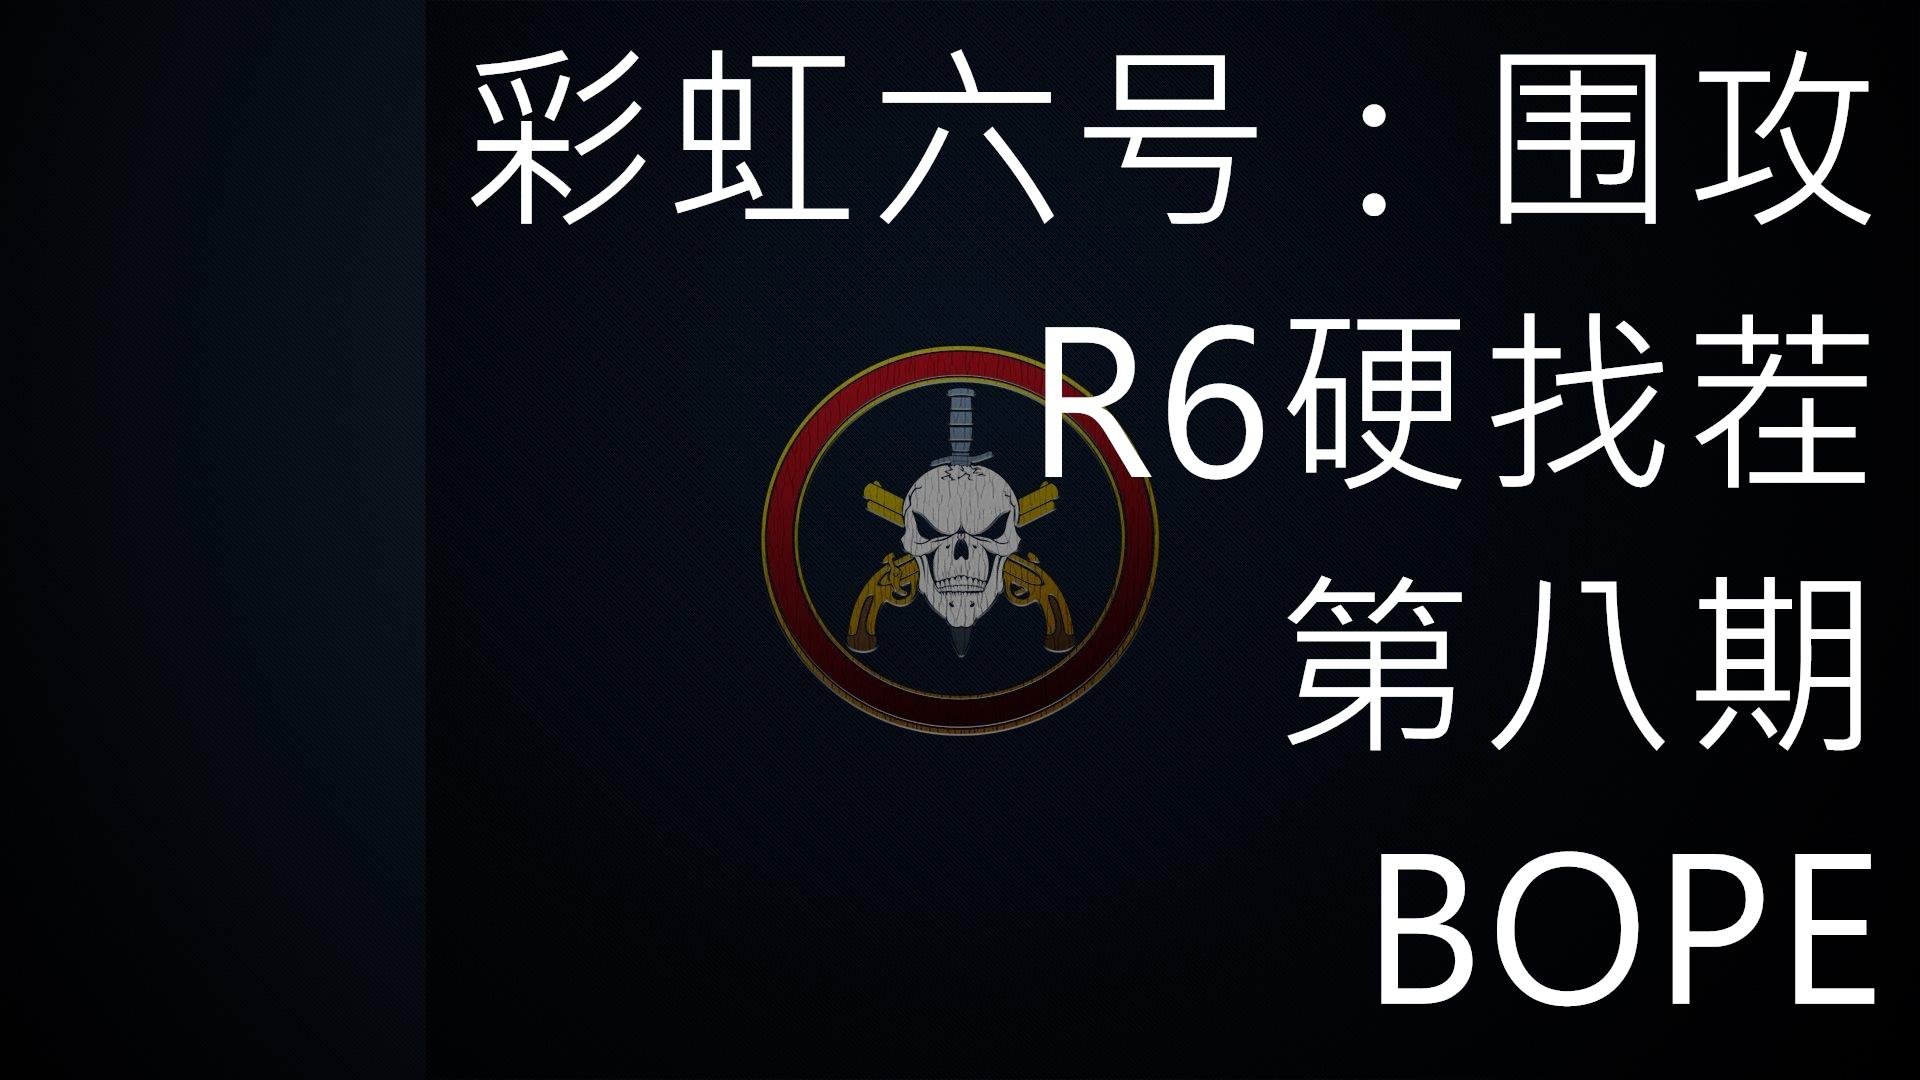 【R6硬找茬】第八期 BOPE(巴西特种警察行动部队)